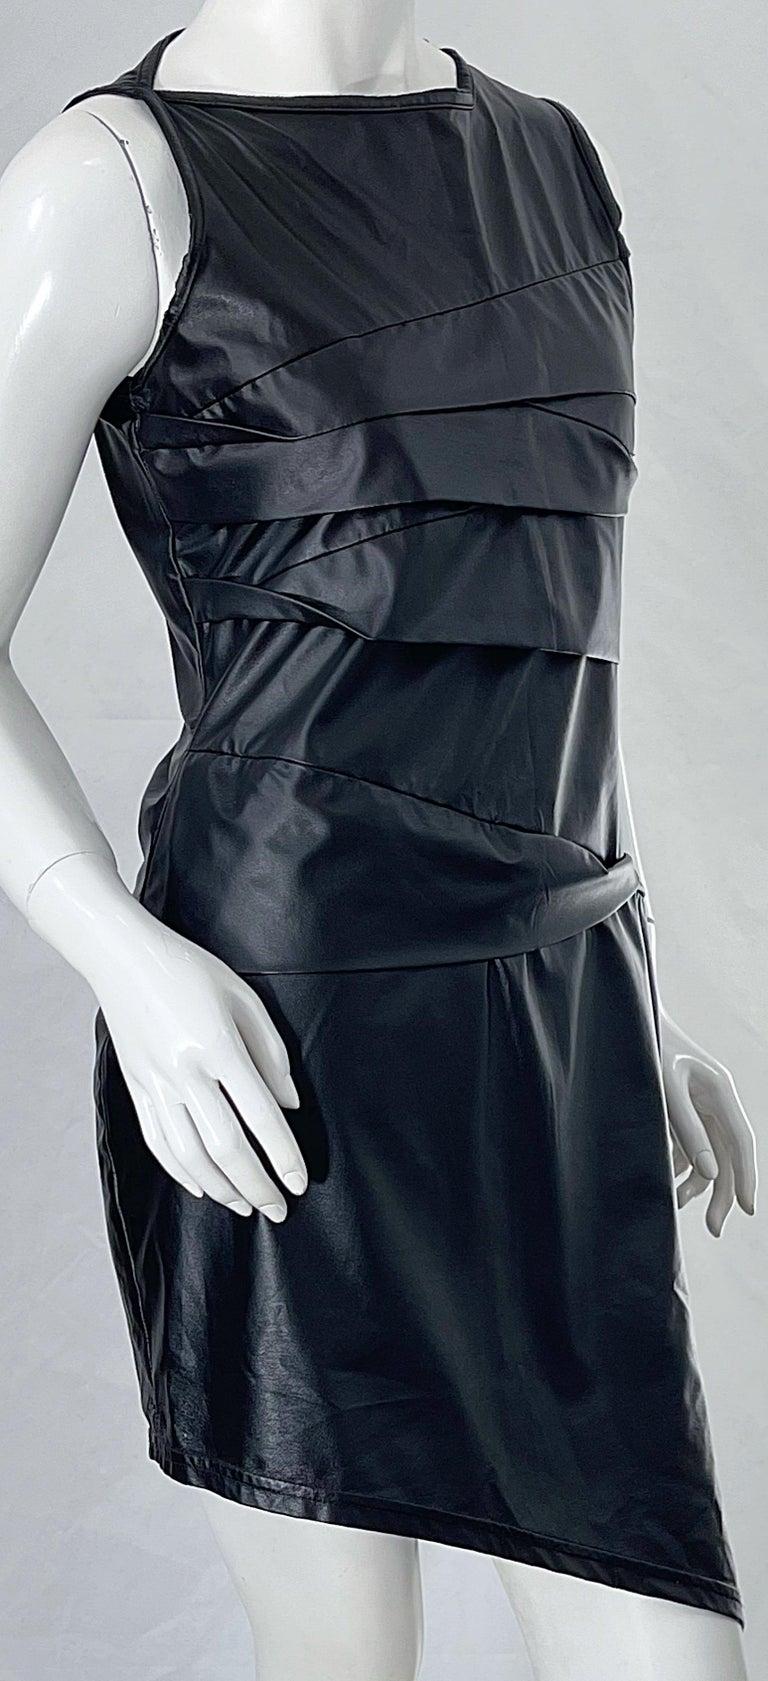 1990s Dexter Wong Club Kid Rave Japanese Black Pleather Vintage 90s Mini Dress For Sale 3